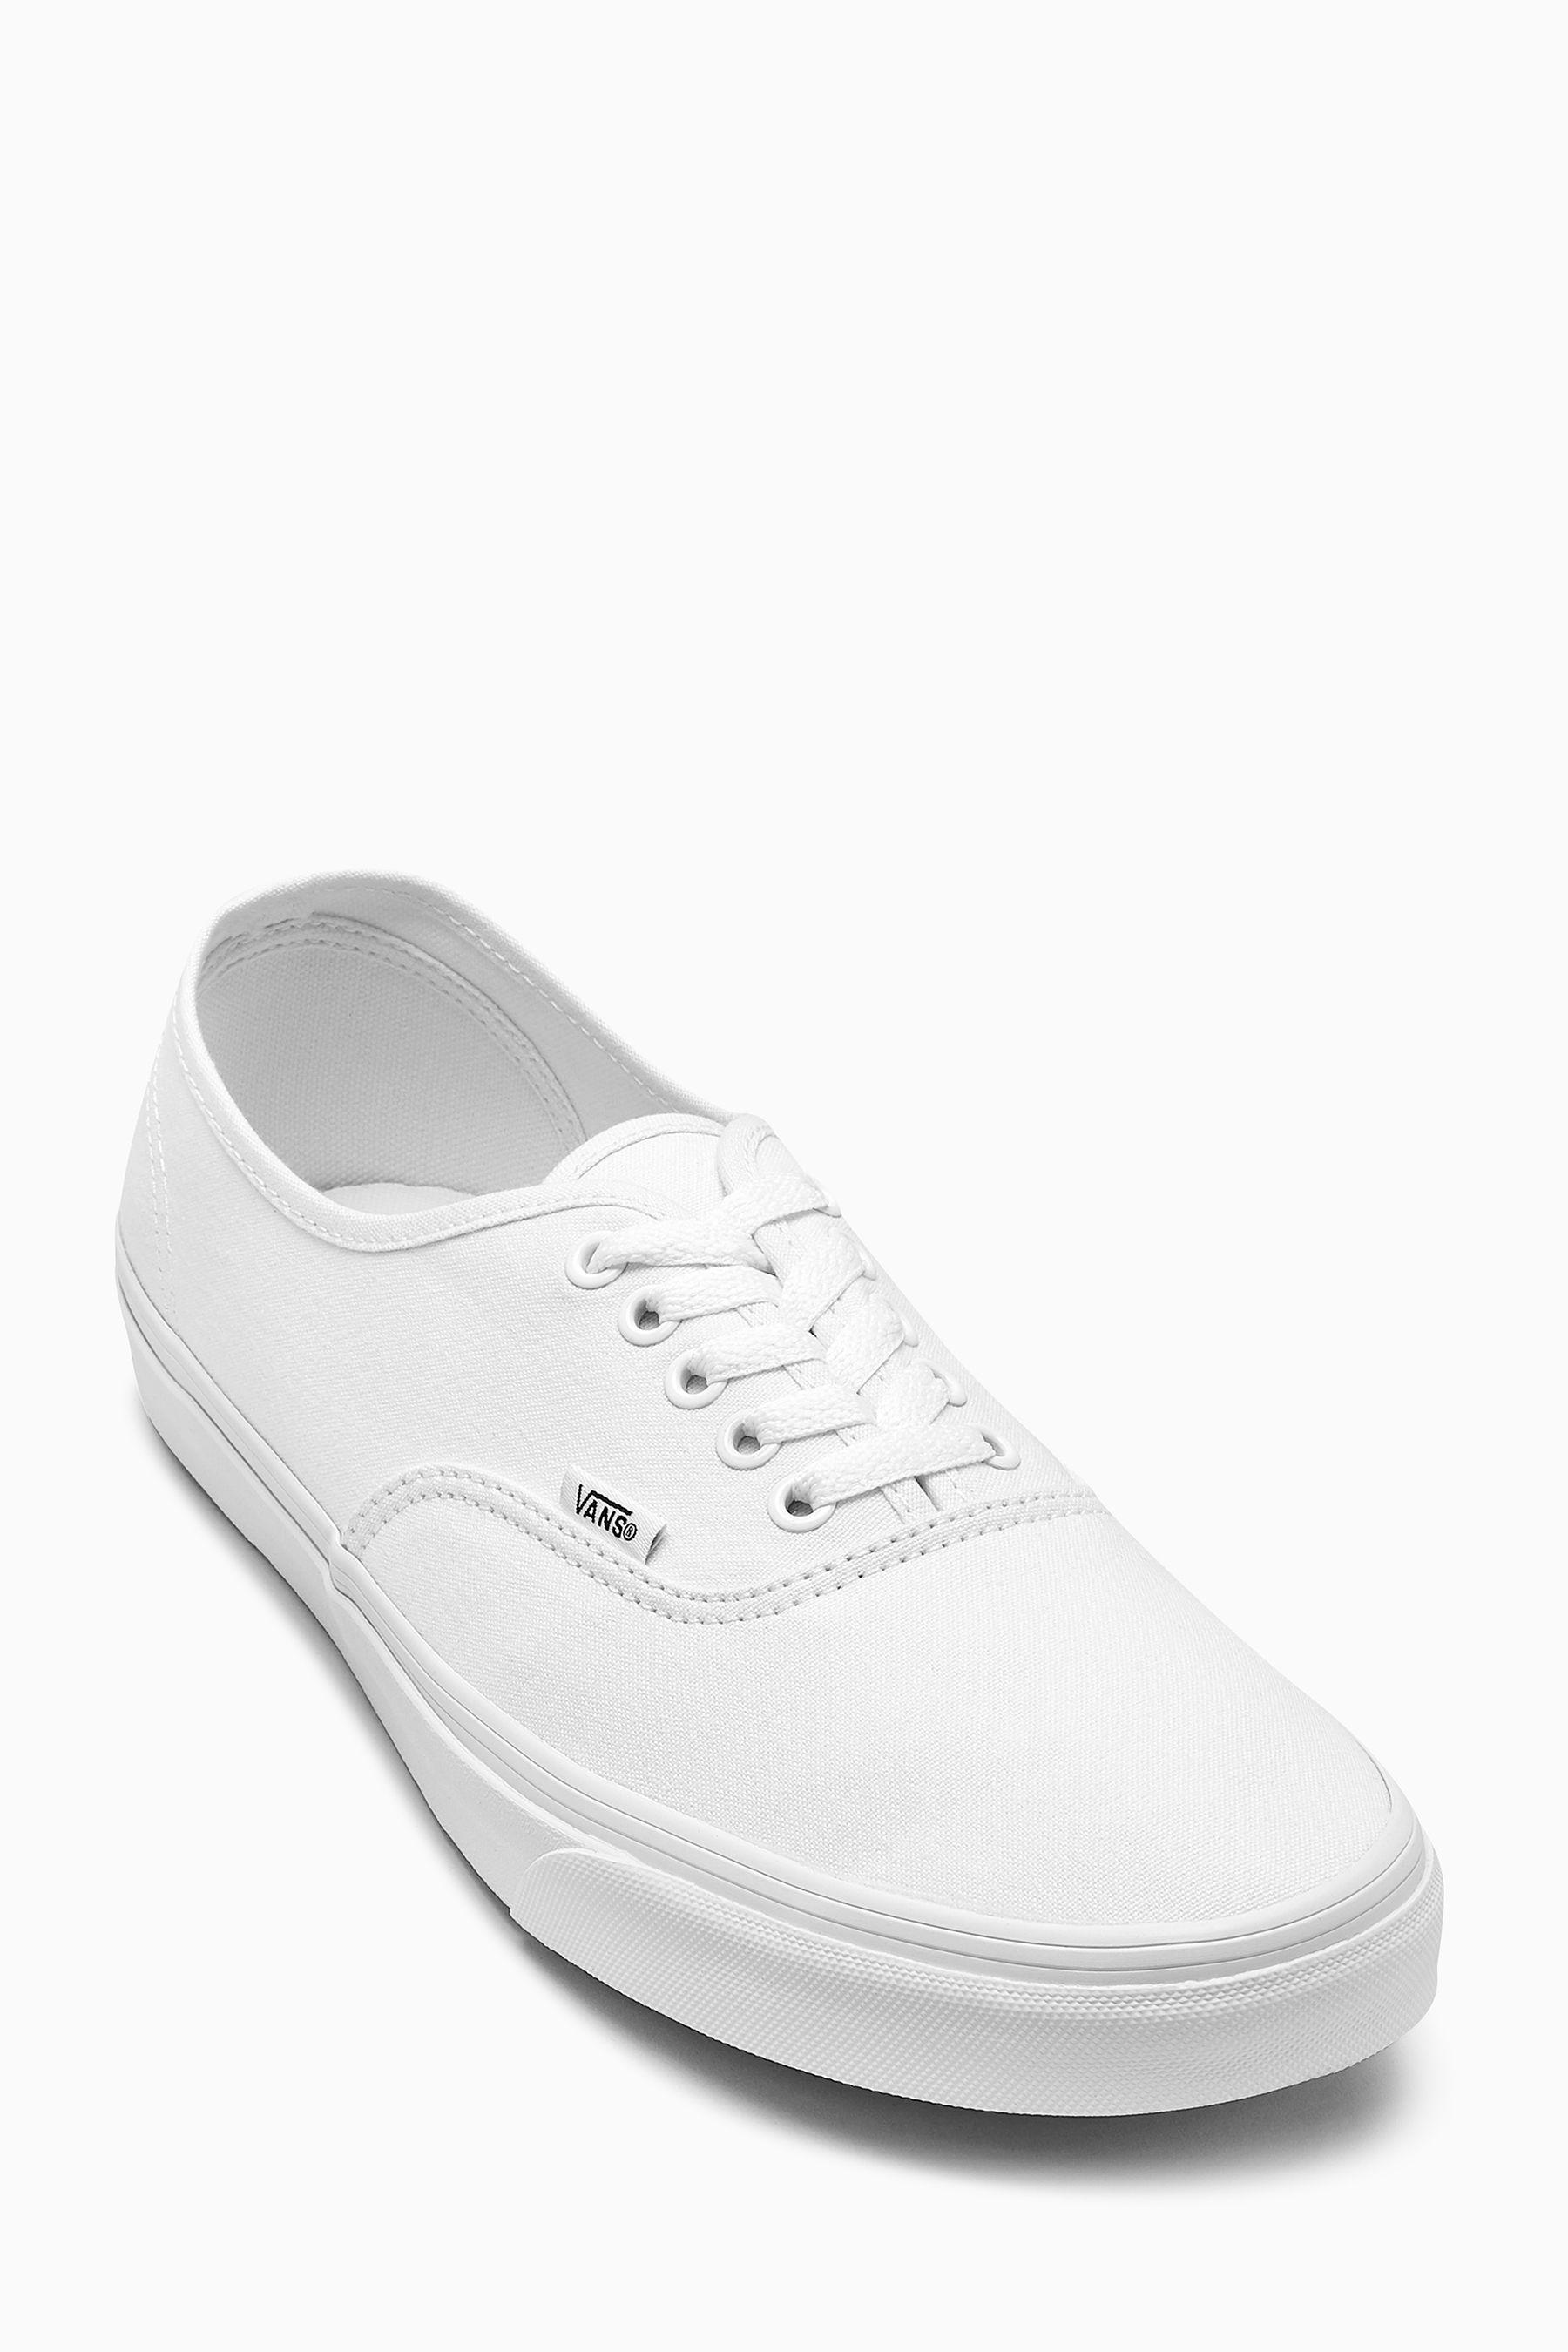 authentic white vans mens